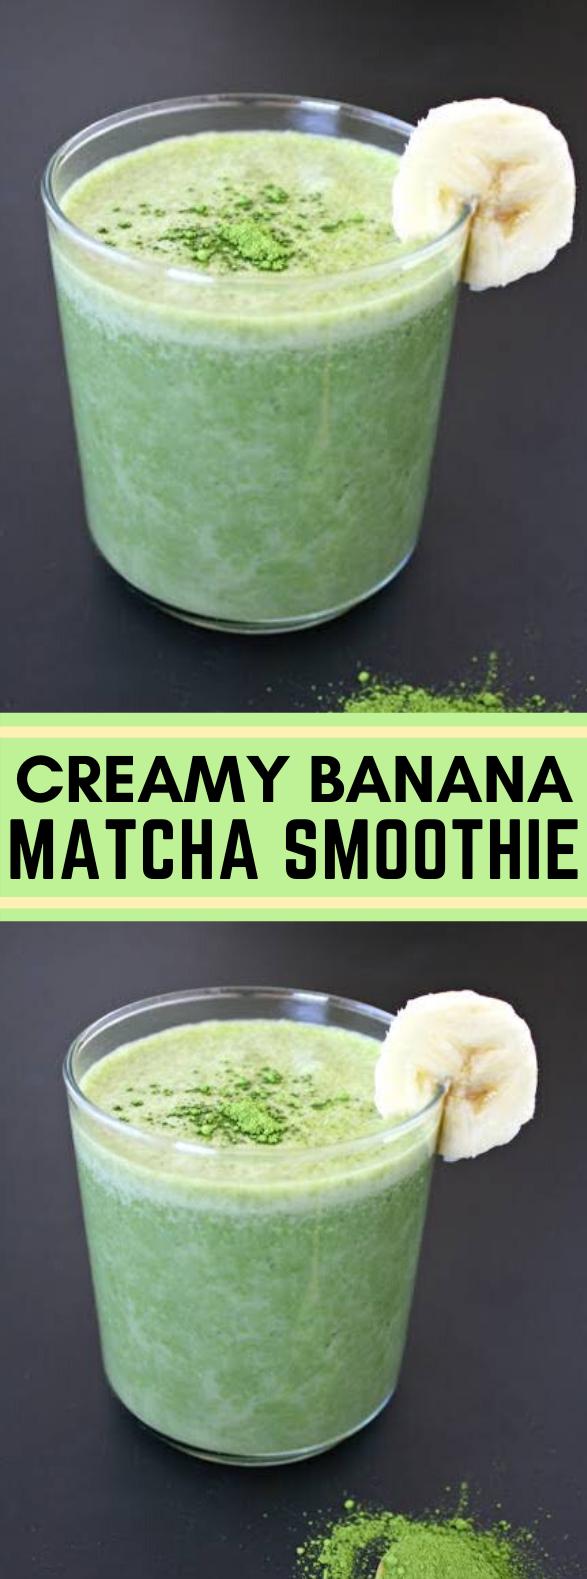 CREAMY BANANA MATCHA SMOOTHIE #drinks #healthy